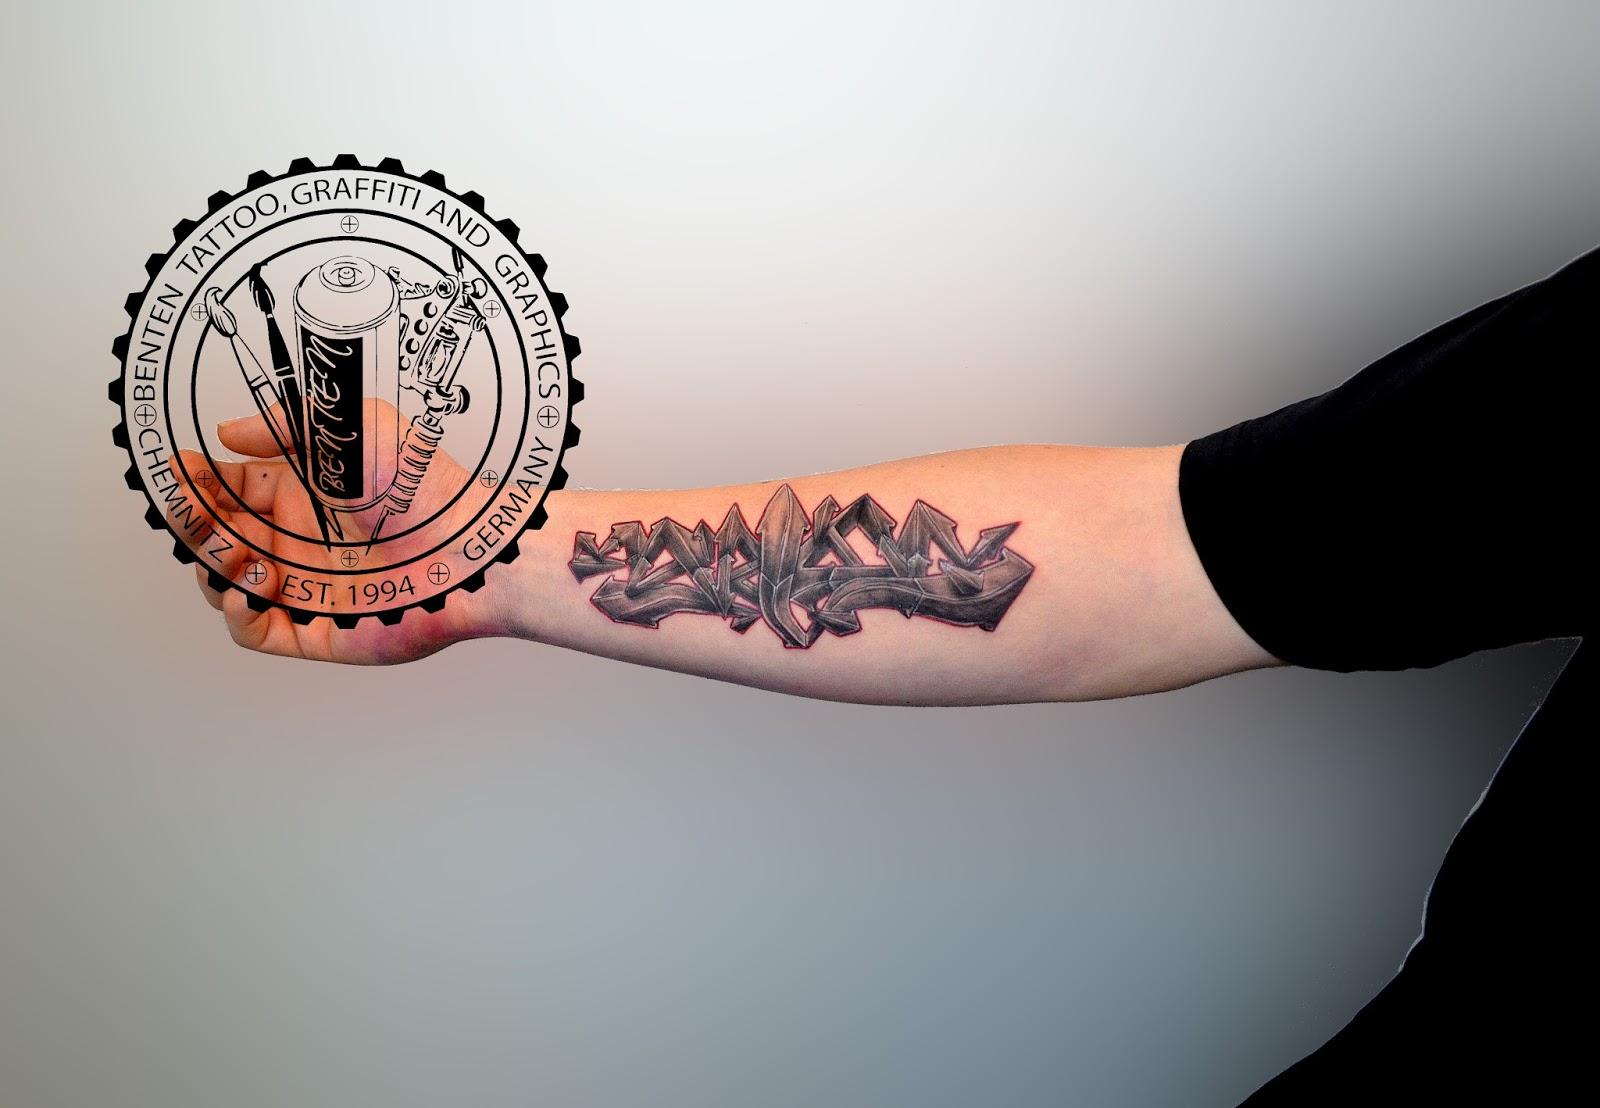 Benten Tattoo Chemnitz - Tattoostudio Chemnitz: 50/50/50 - Tattoo Studio Chemnitz